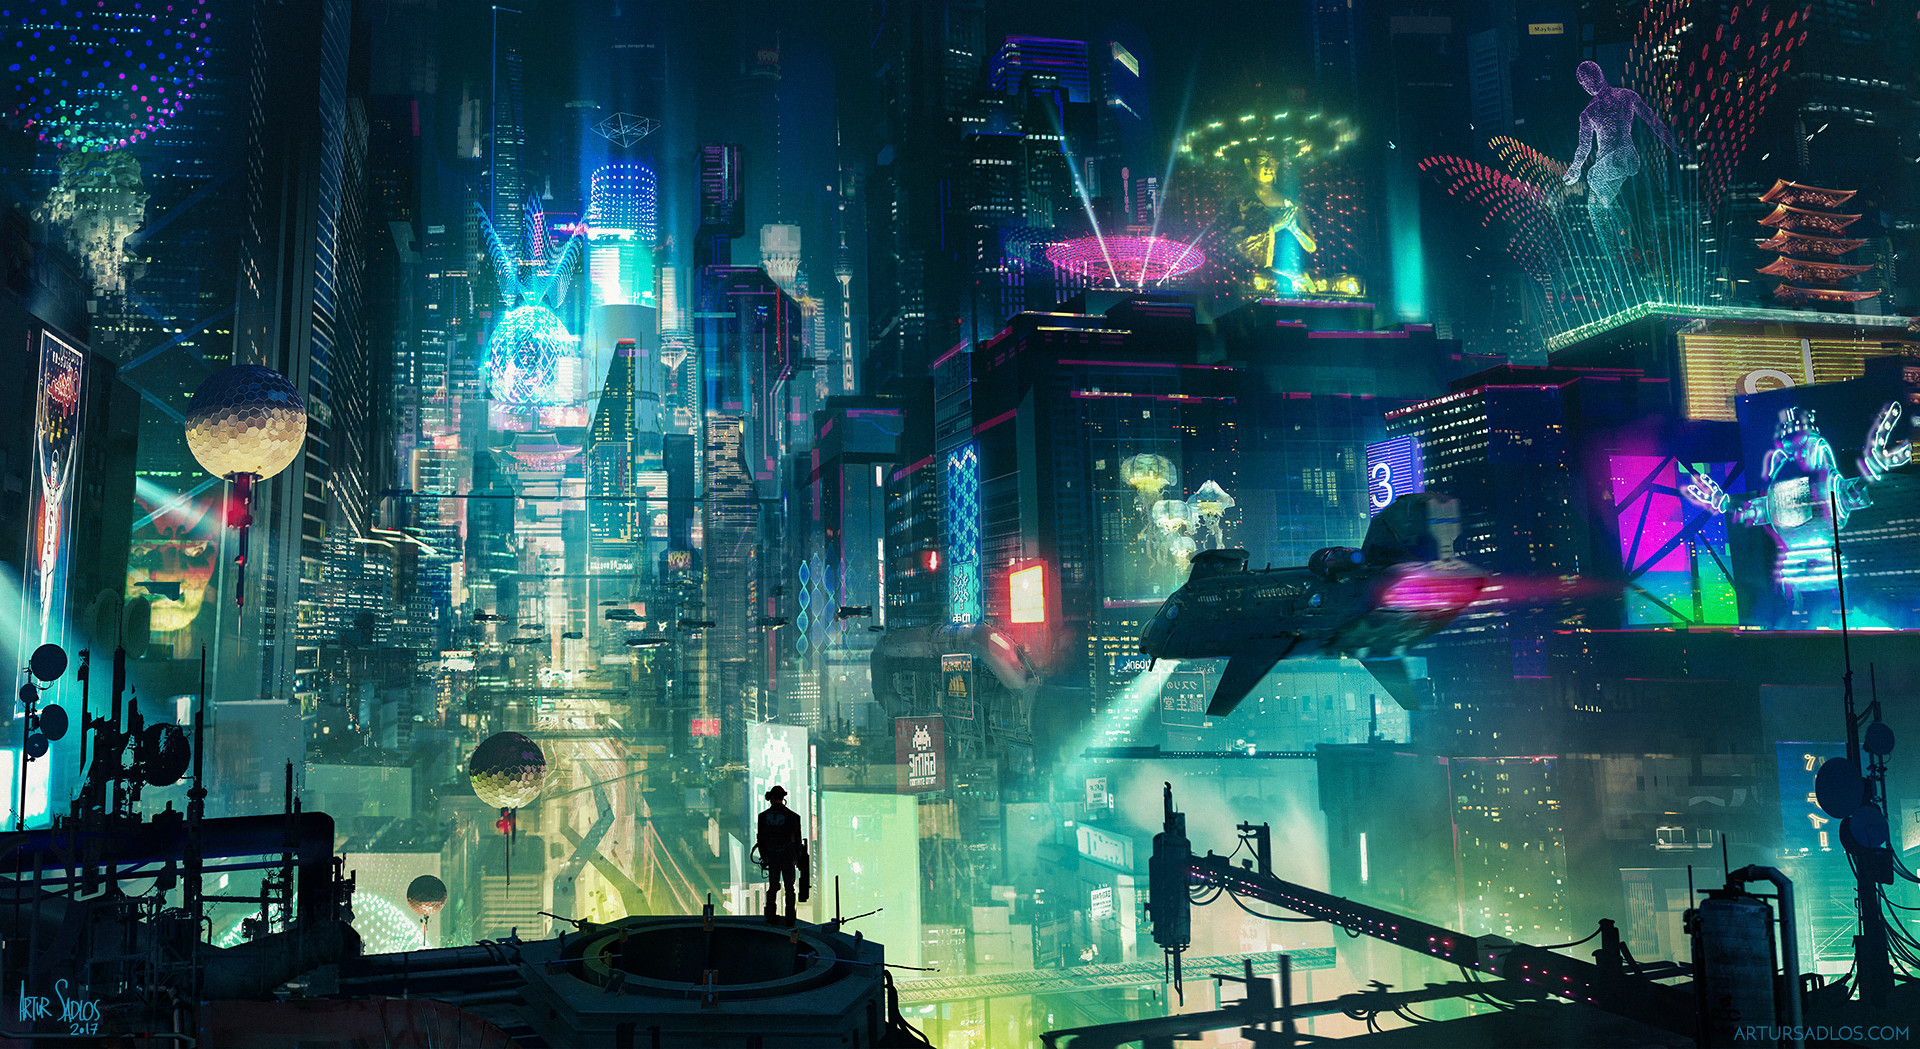 Cyberpunk City by Artur Sadlos